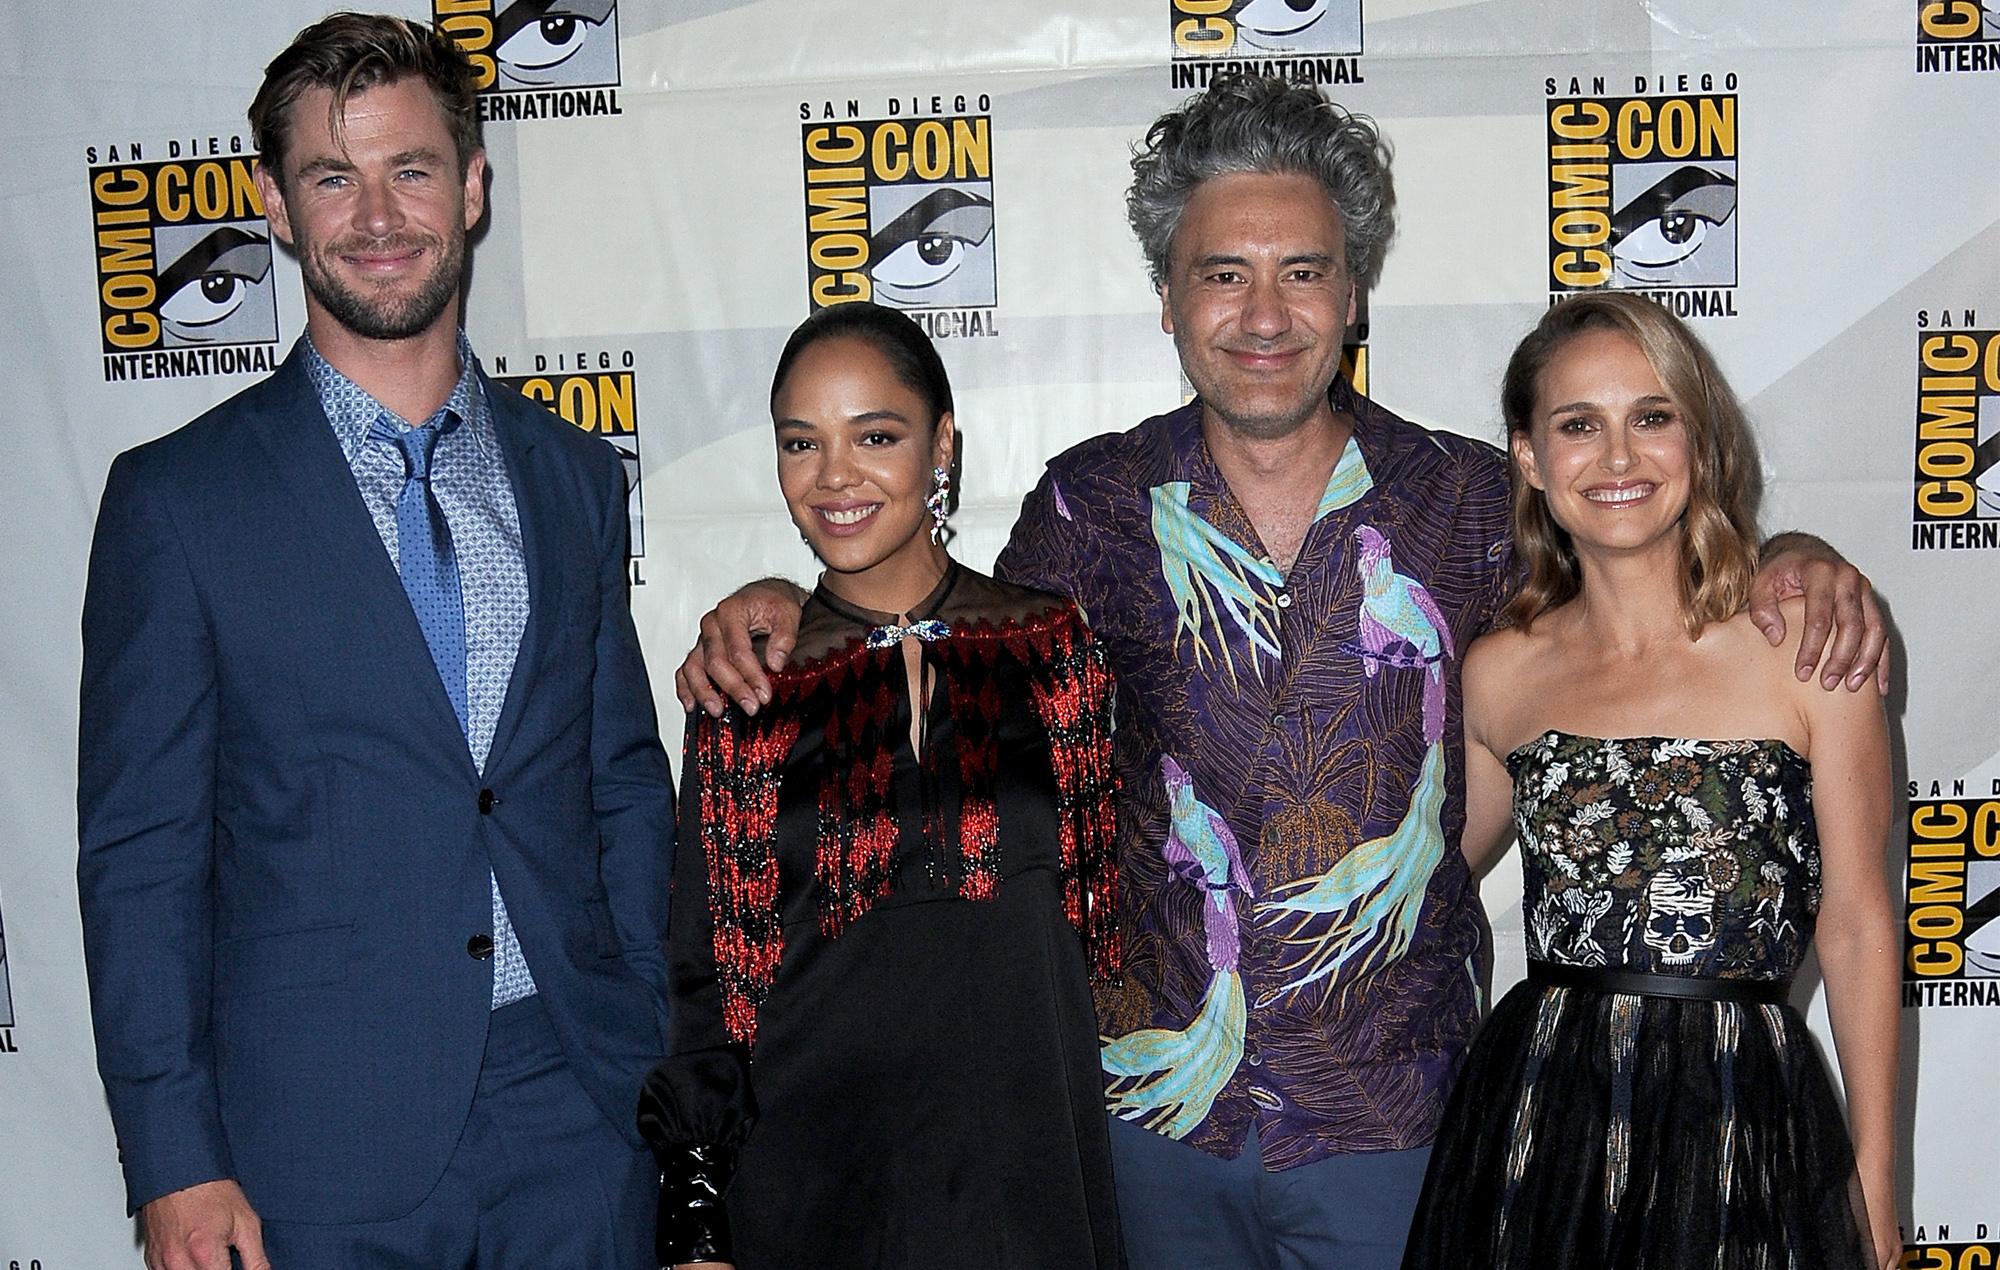 Thor Love and Thunder filming in Australia Chris Hemsworth Taika Waititi Tessa Thompson Russell Crowe Natalie Portman